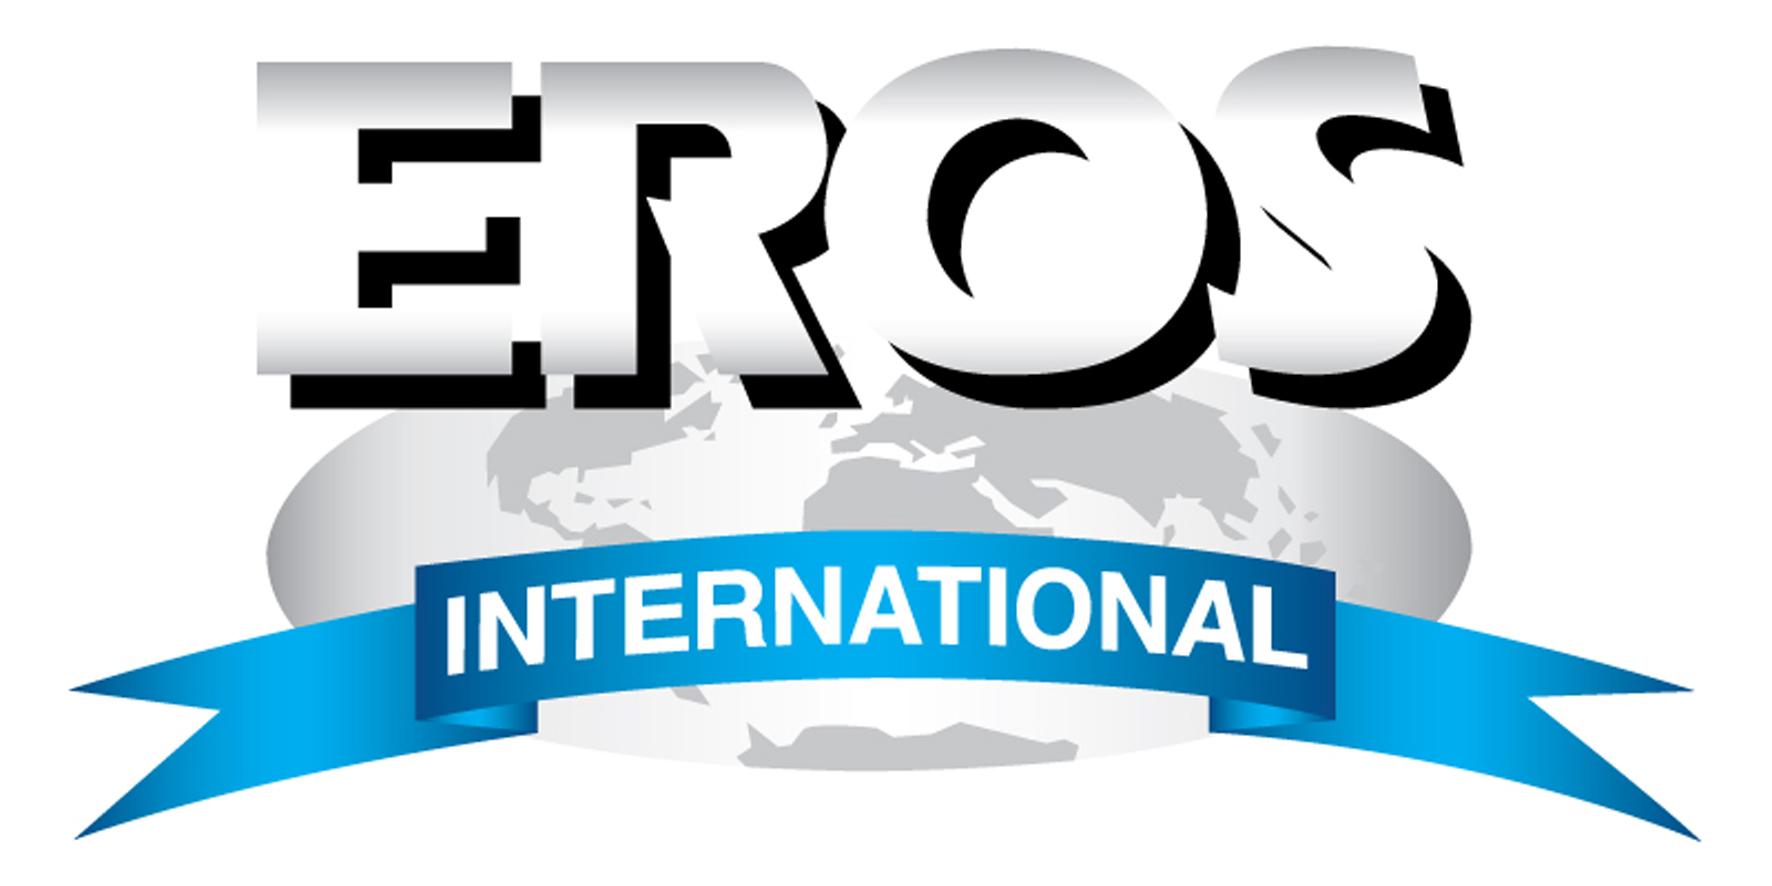 Eros International plc logo